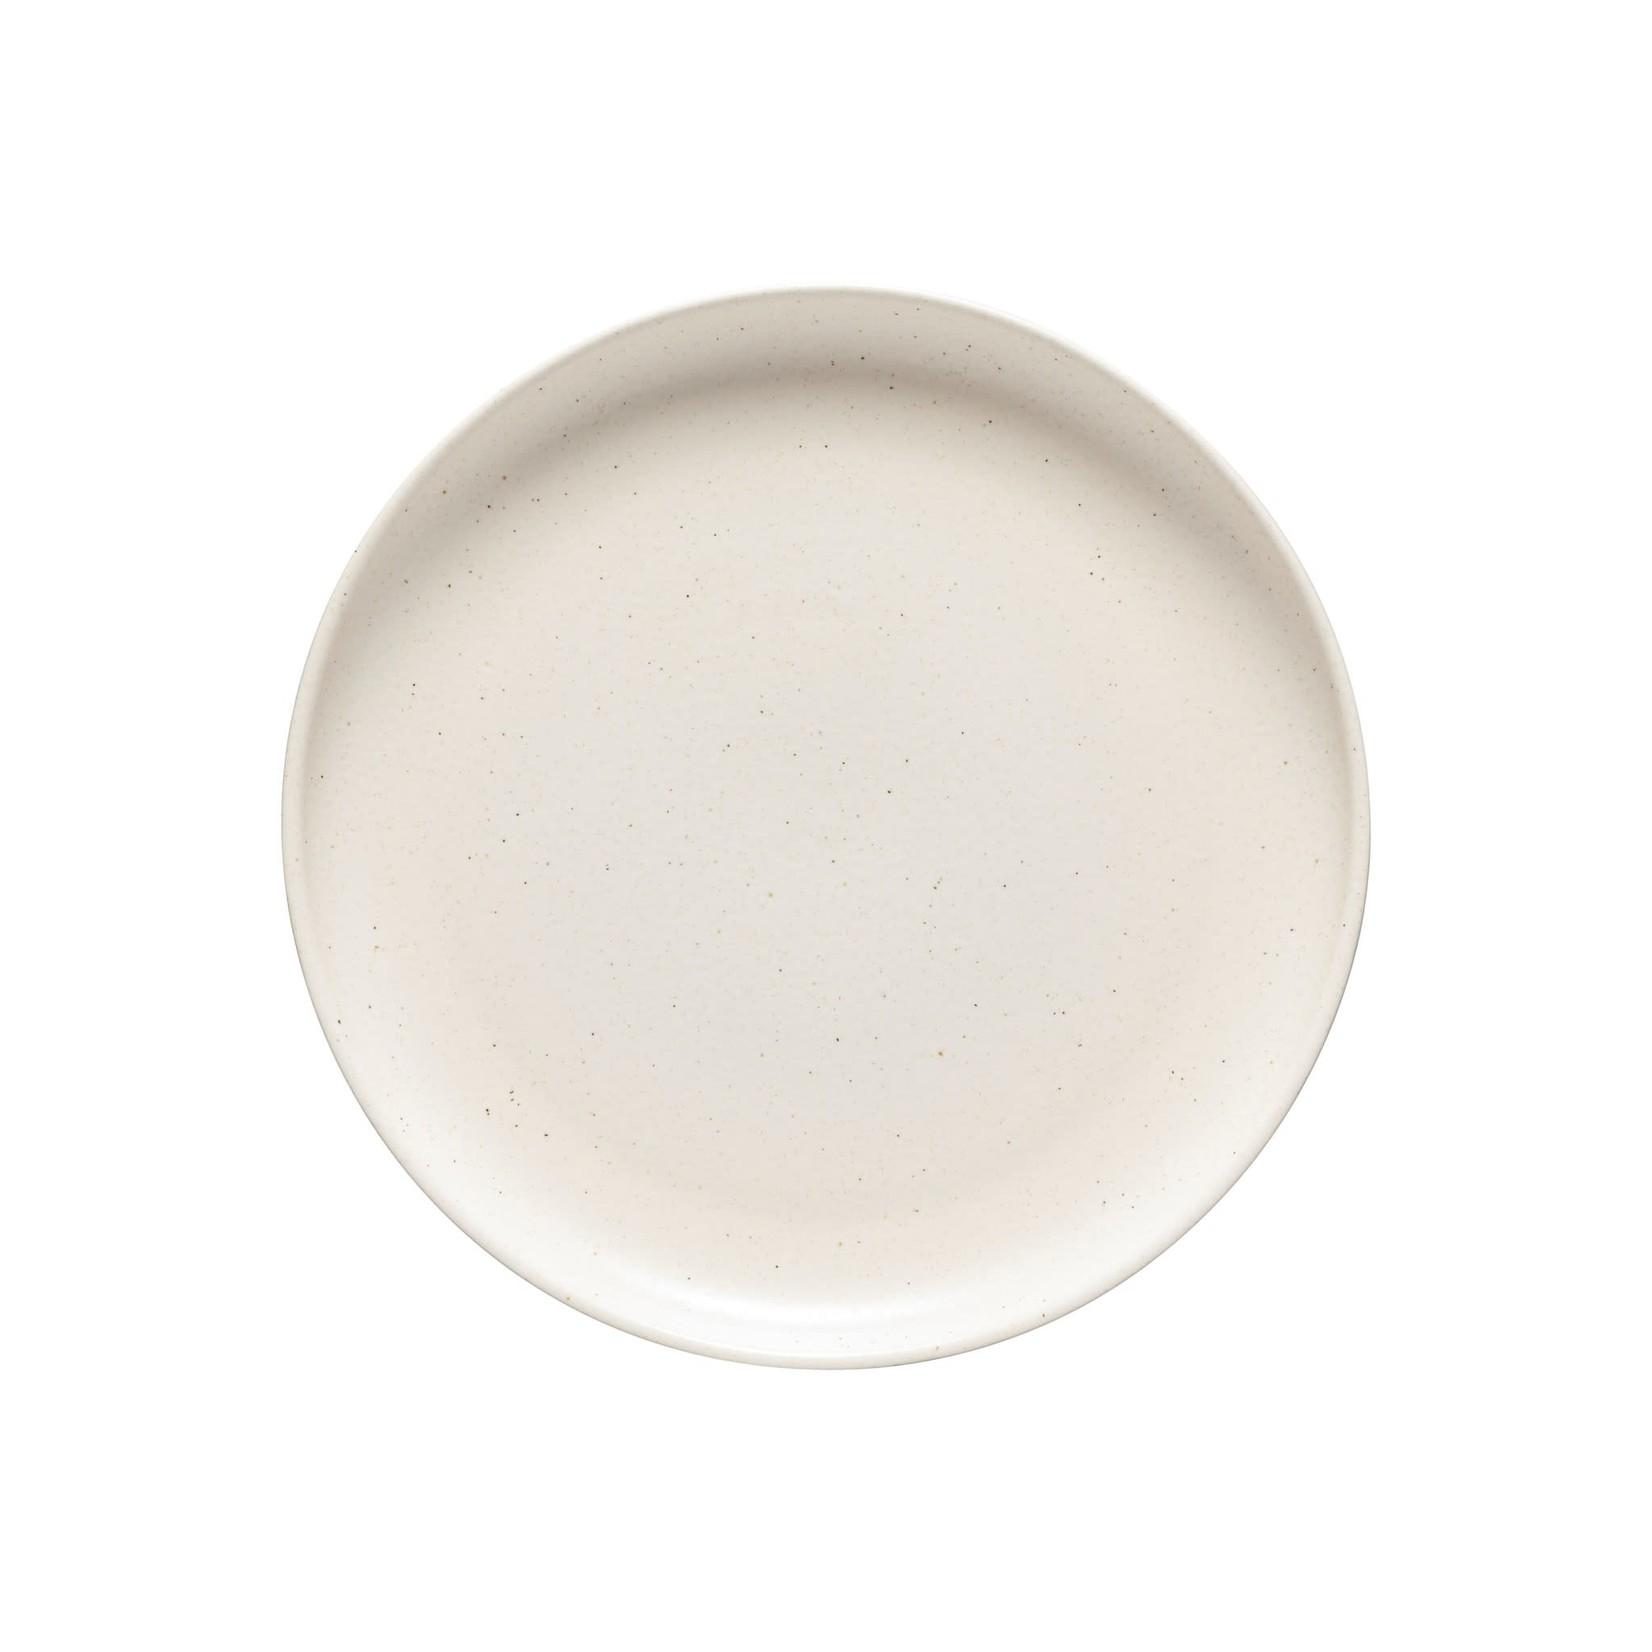 David Shaw PACIFICA vanille - Assiette à dîner